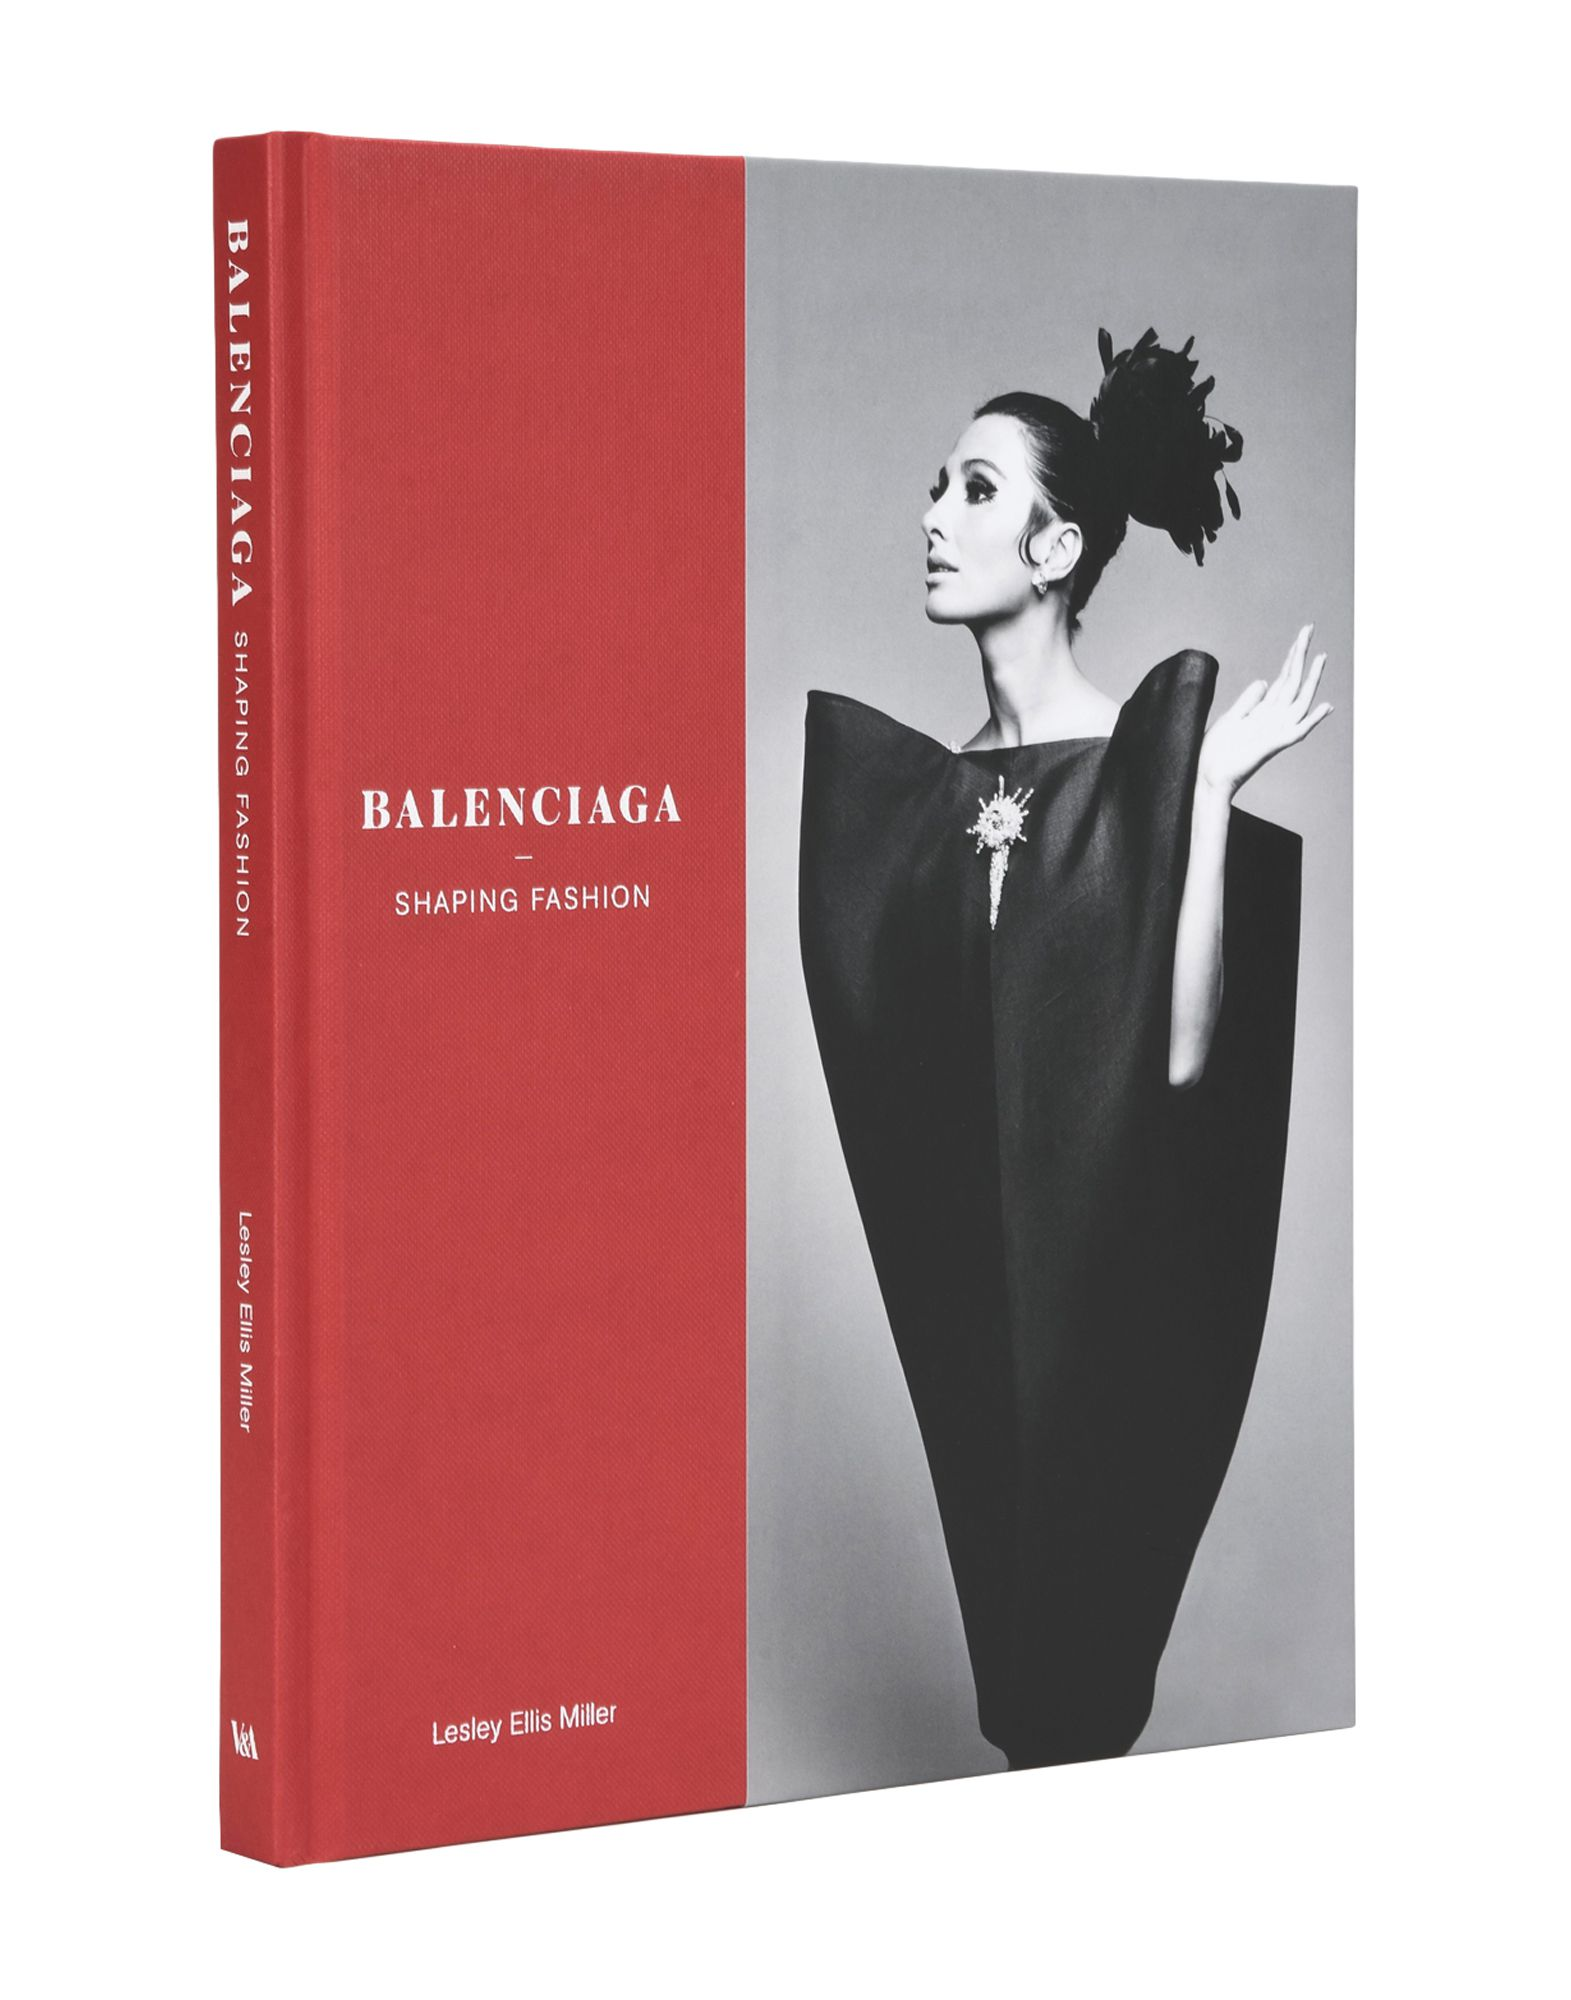 fashion design books for fashion students the best design books Vu0026A PUBLISHING. Balenciaga Shaping Fashion [-]. Fashion Book